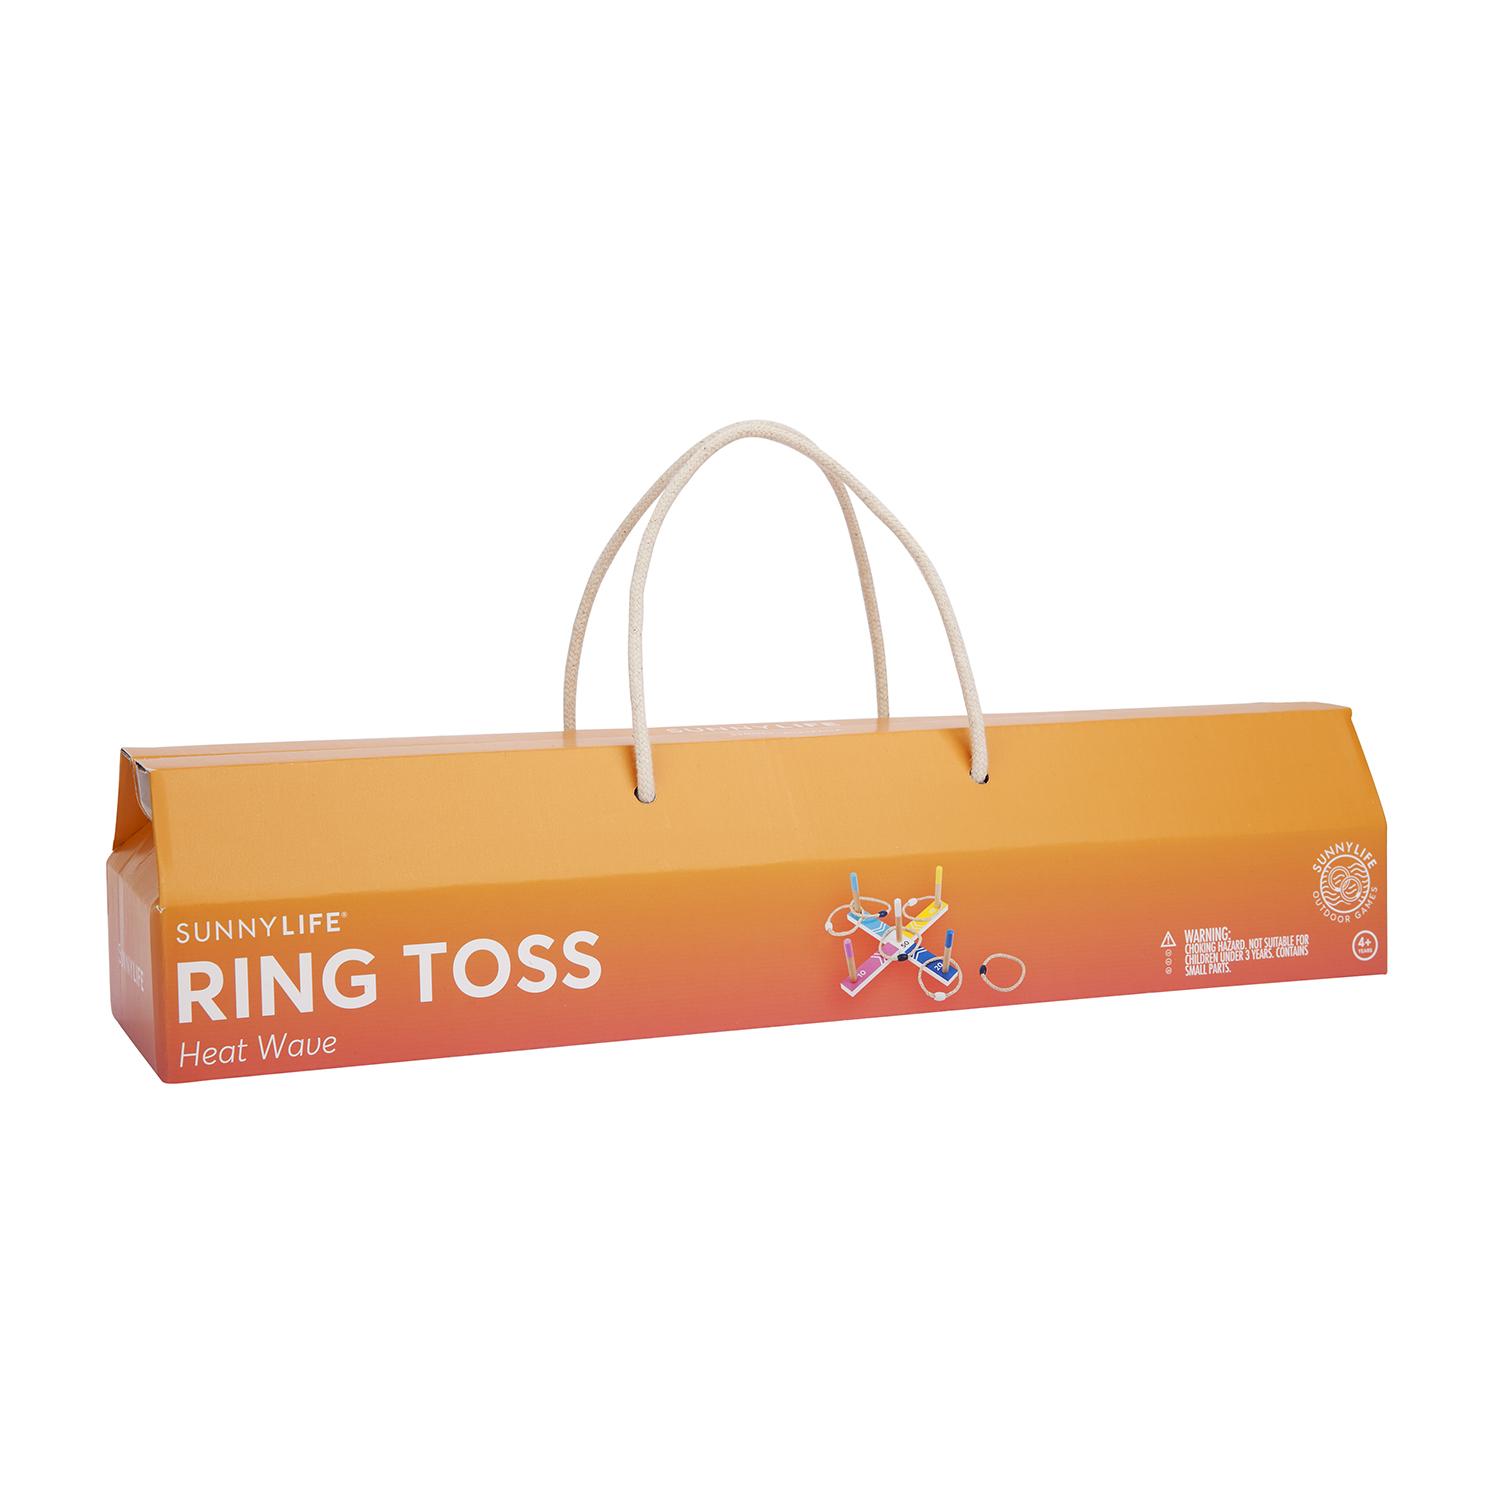 Sunnylife – Heat Wave Ring Toss Set in Box